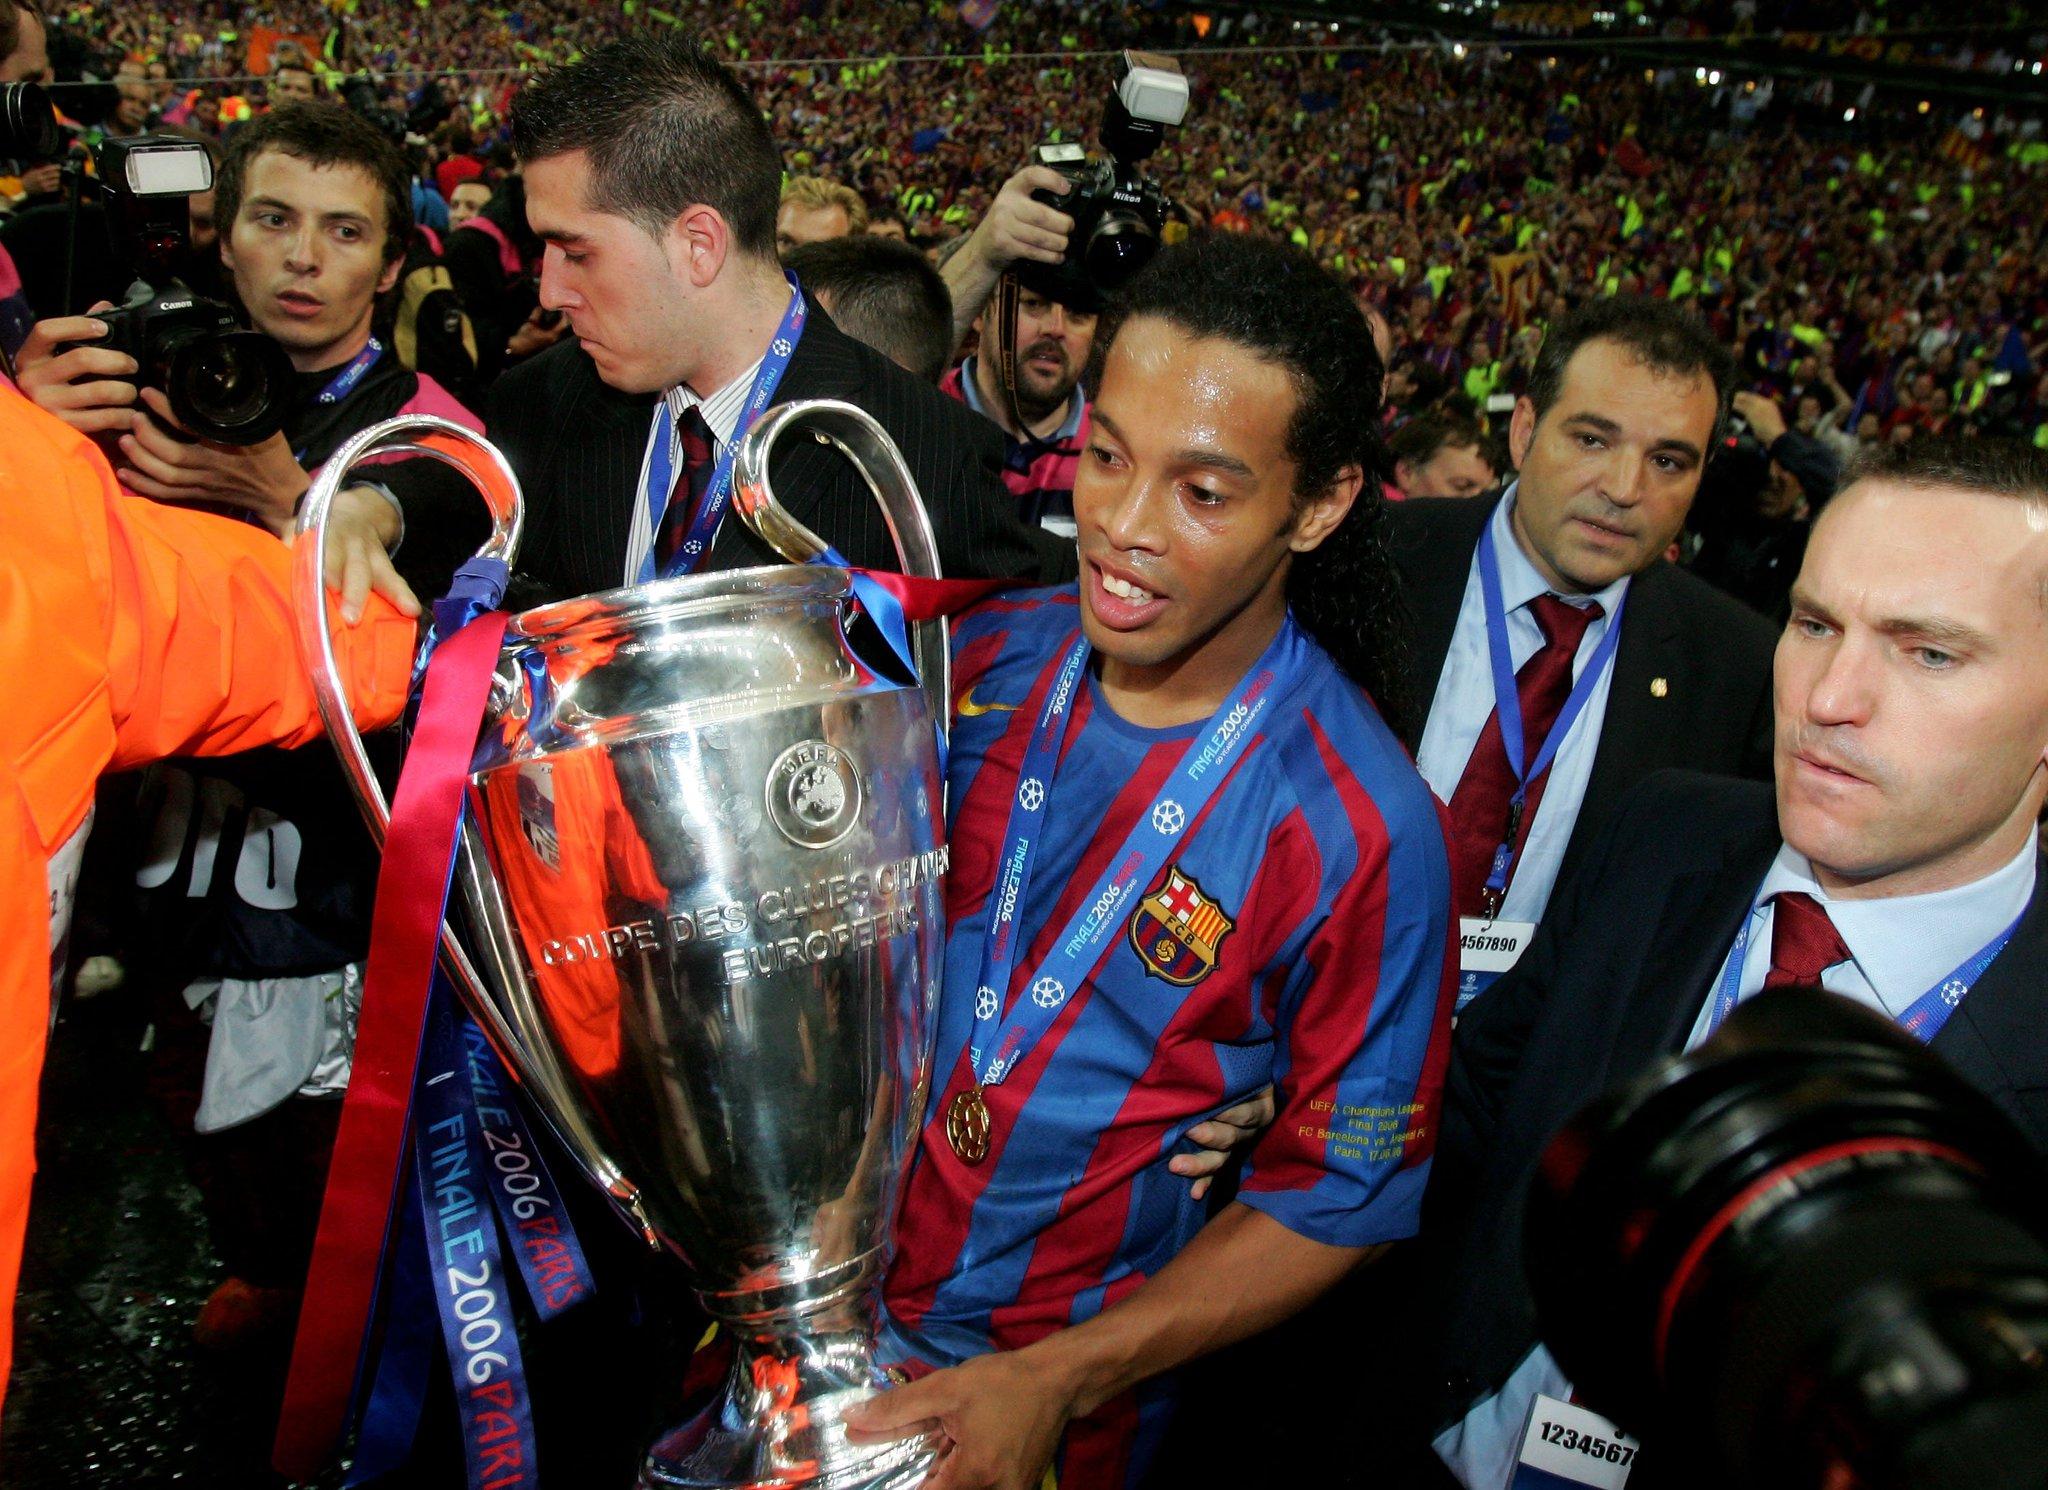 2006 #UCL winner Ronaldinho has retired from football �� https://t.co/EJTHCqcoFd